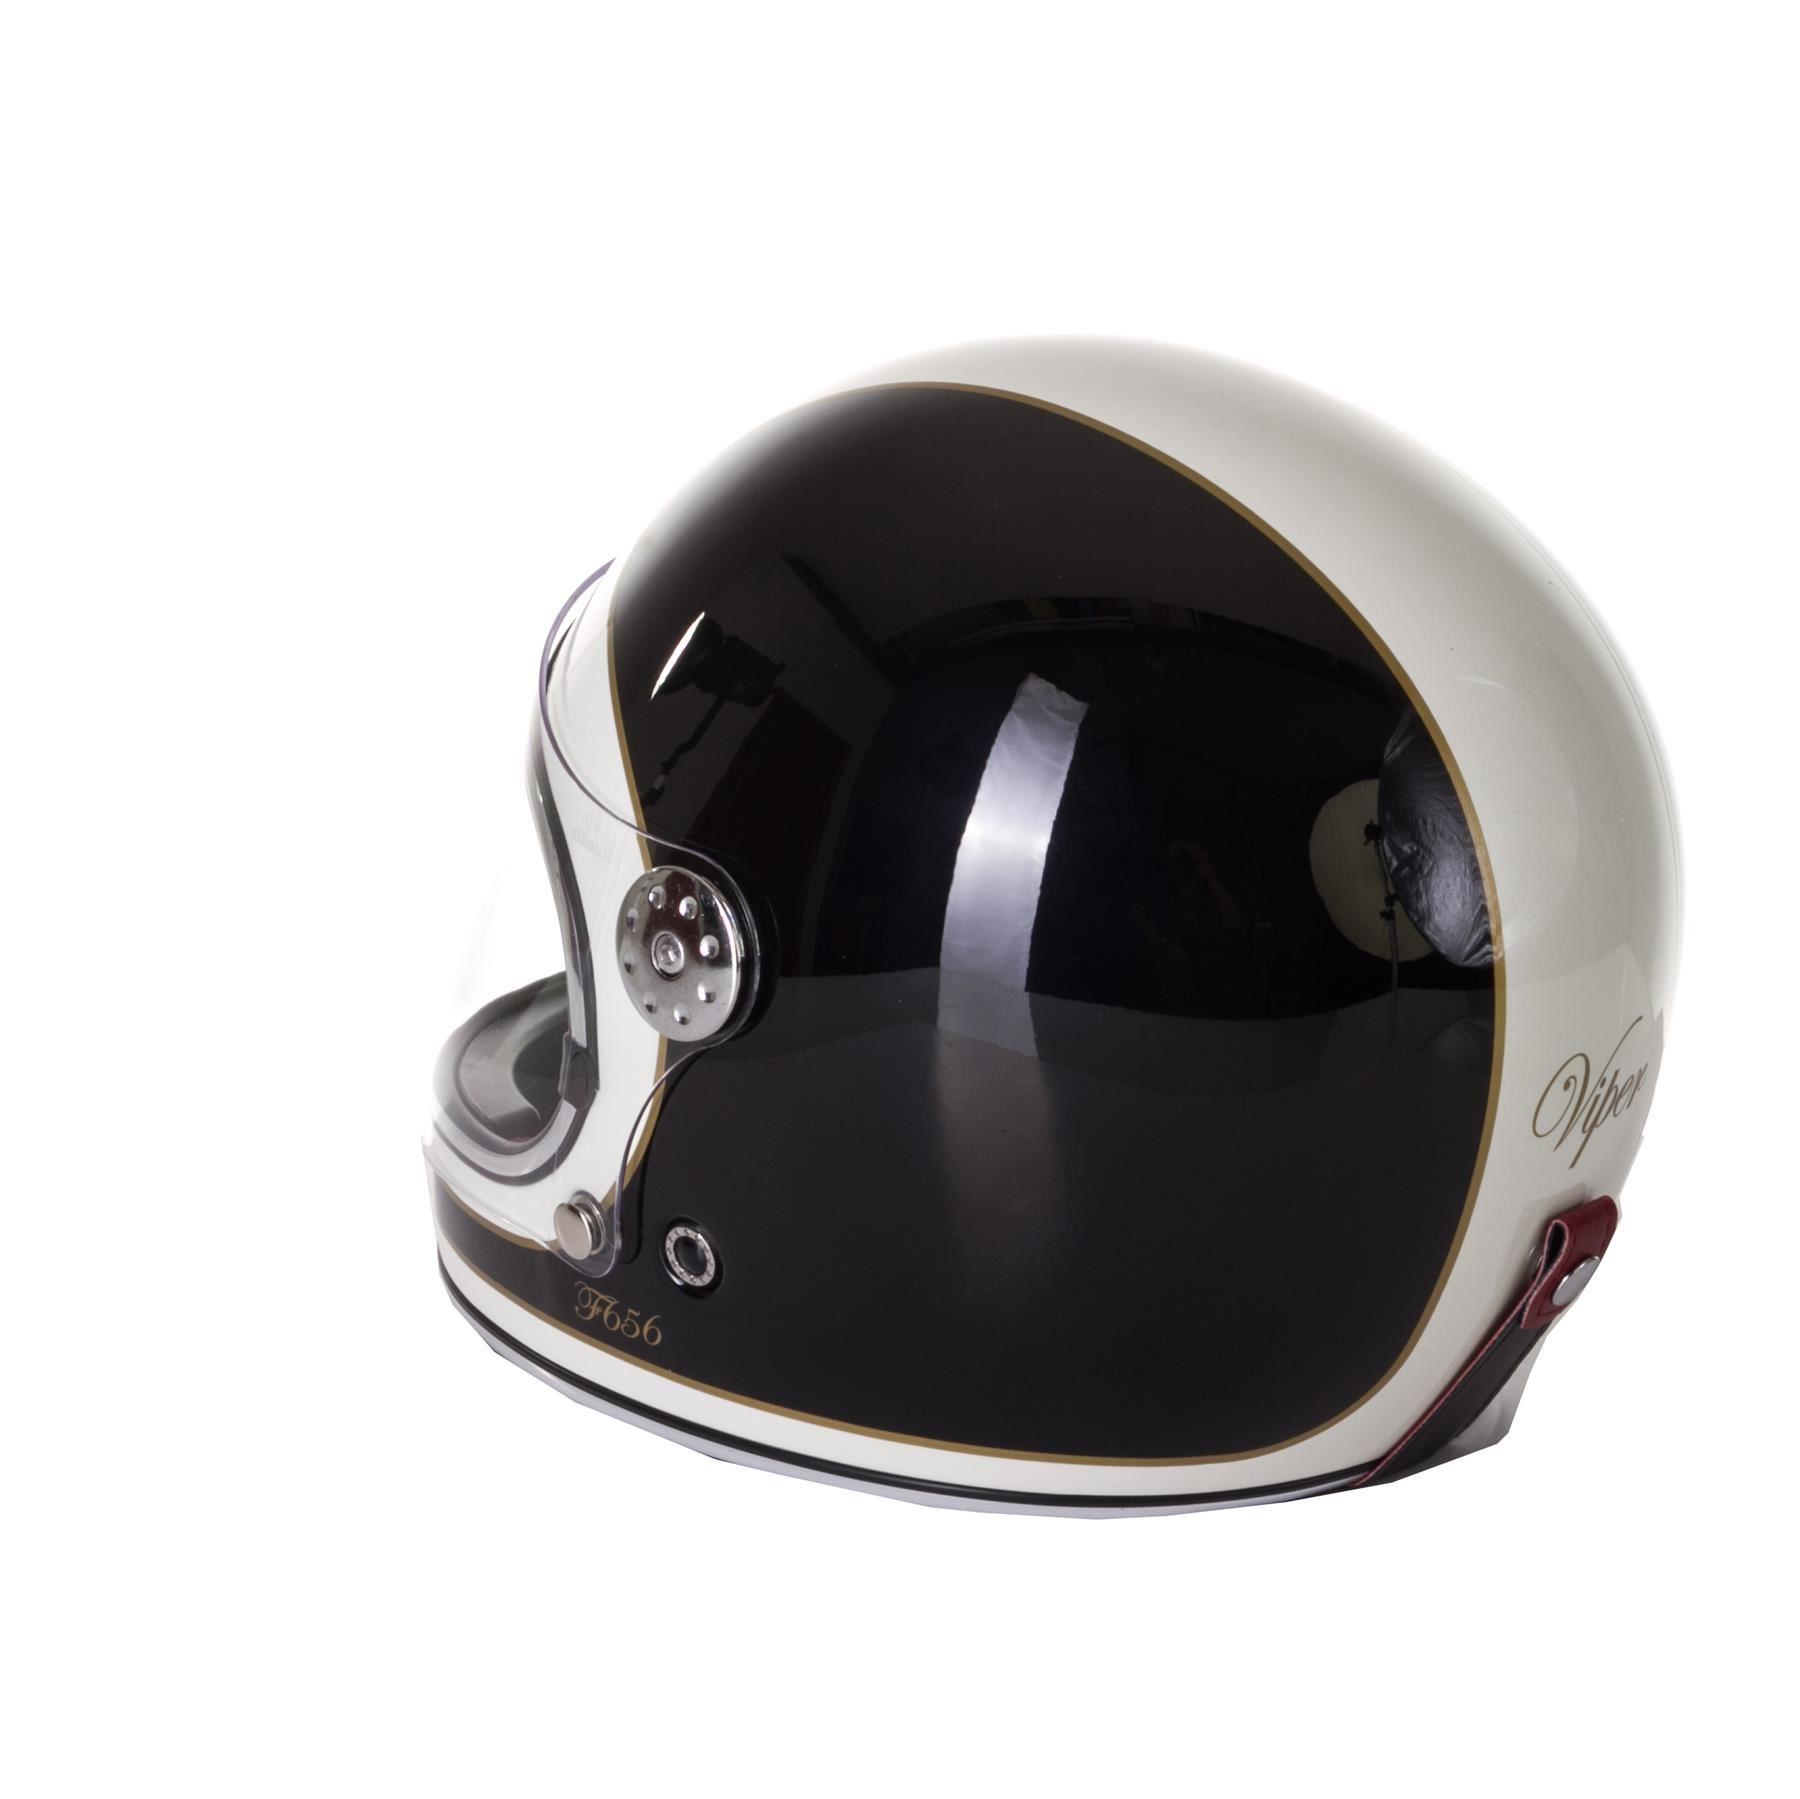 Viper-F656-Retro-Vintage-FibreGlass-Full-Face-Motorcycle-Bike-Road-Crash-Helmet miniature 5